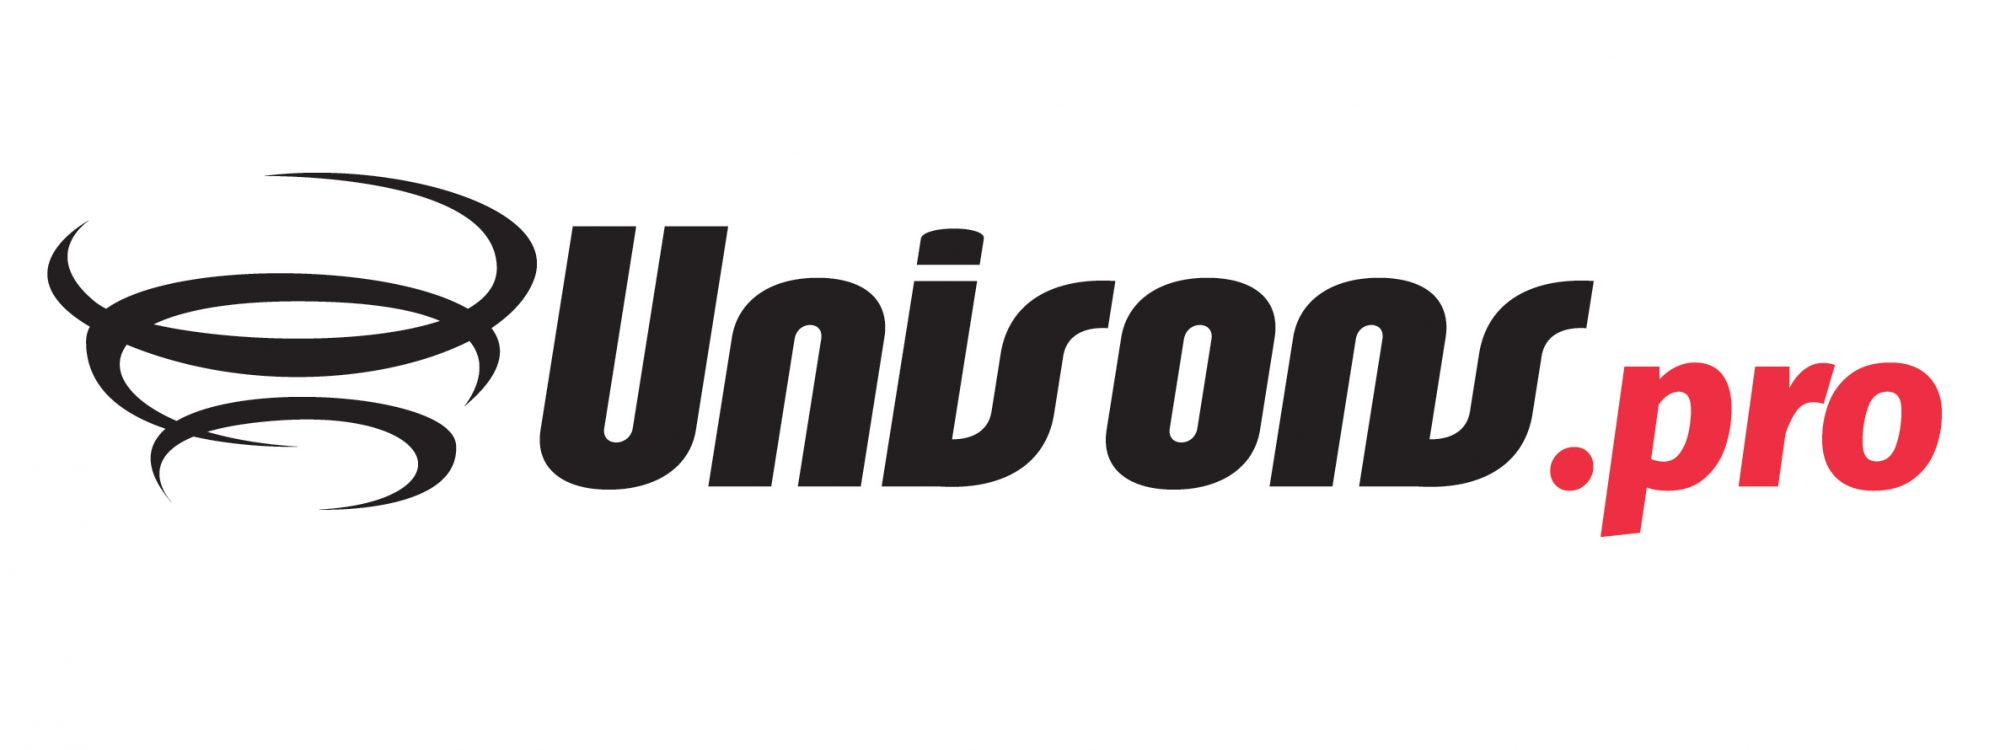 logo Studio unison